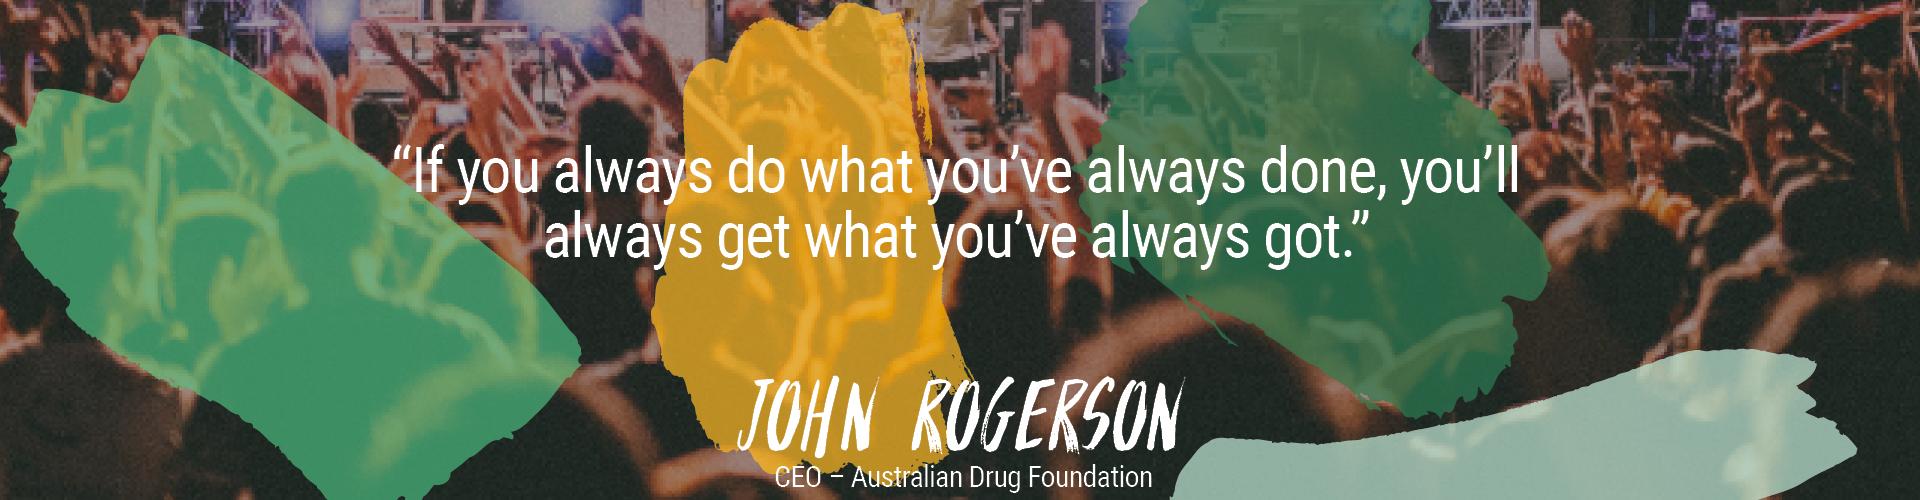 John Rogerson